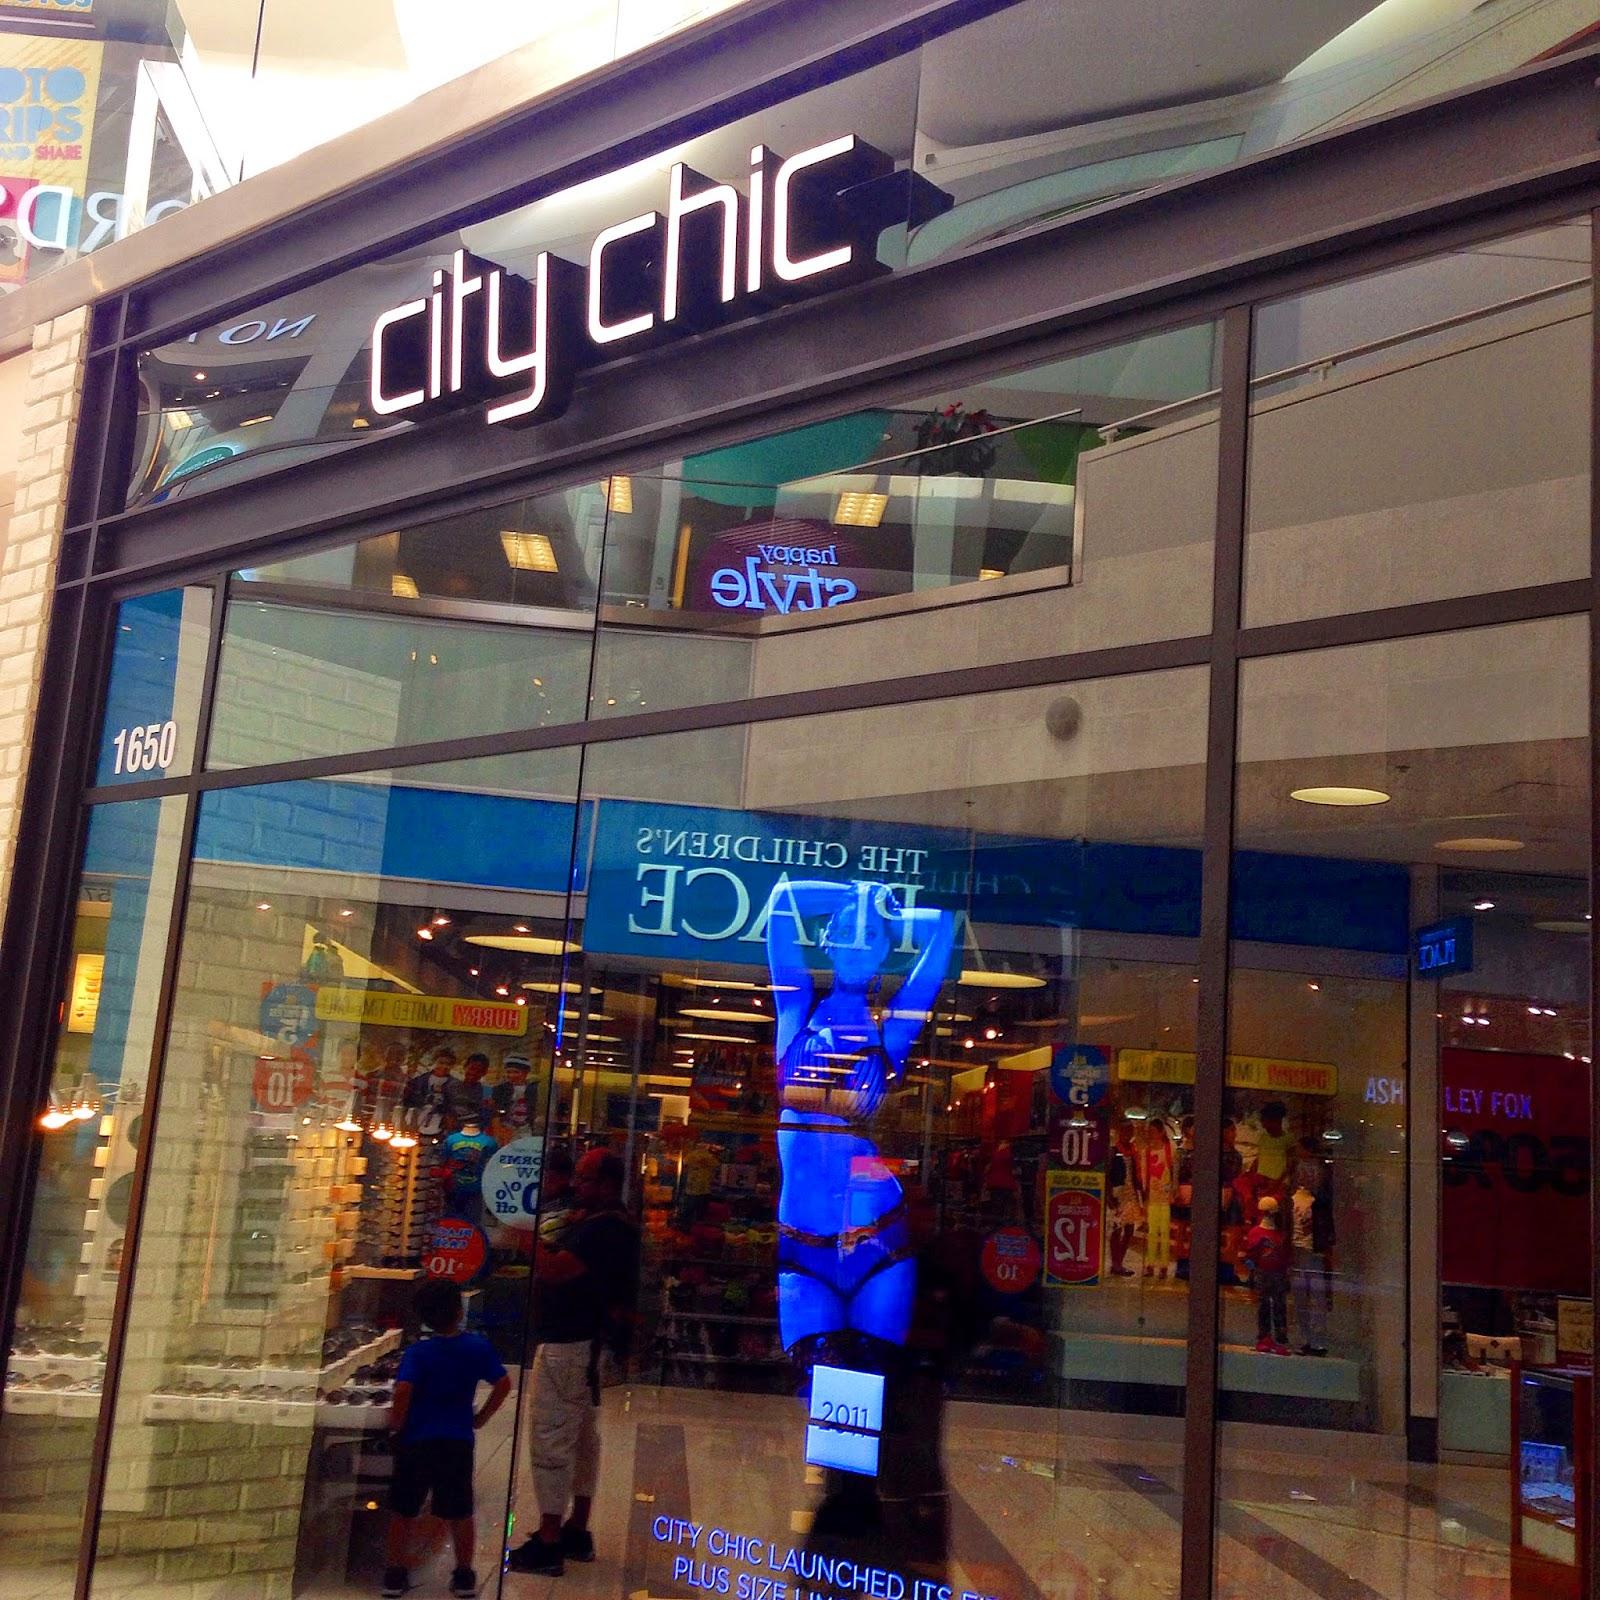 city chic, westfiled, culver city mall, plus size fashion, Australian plus size store